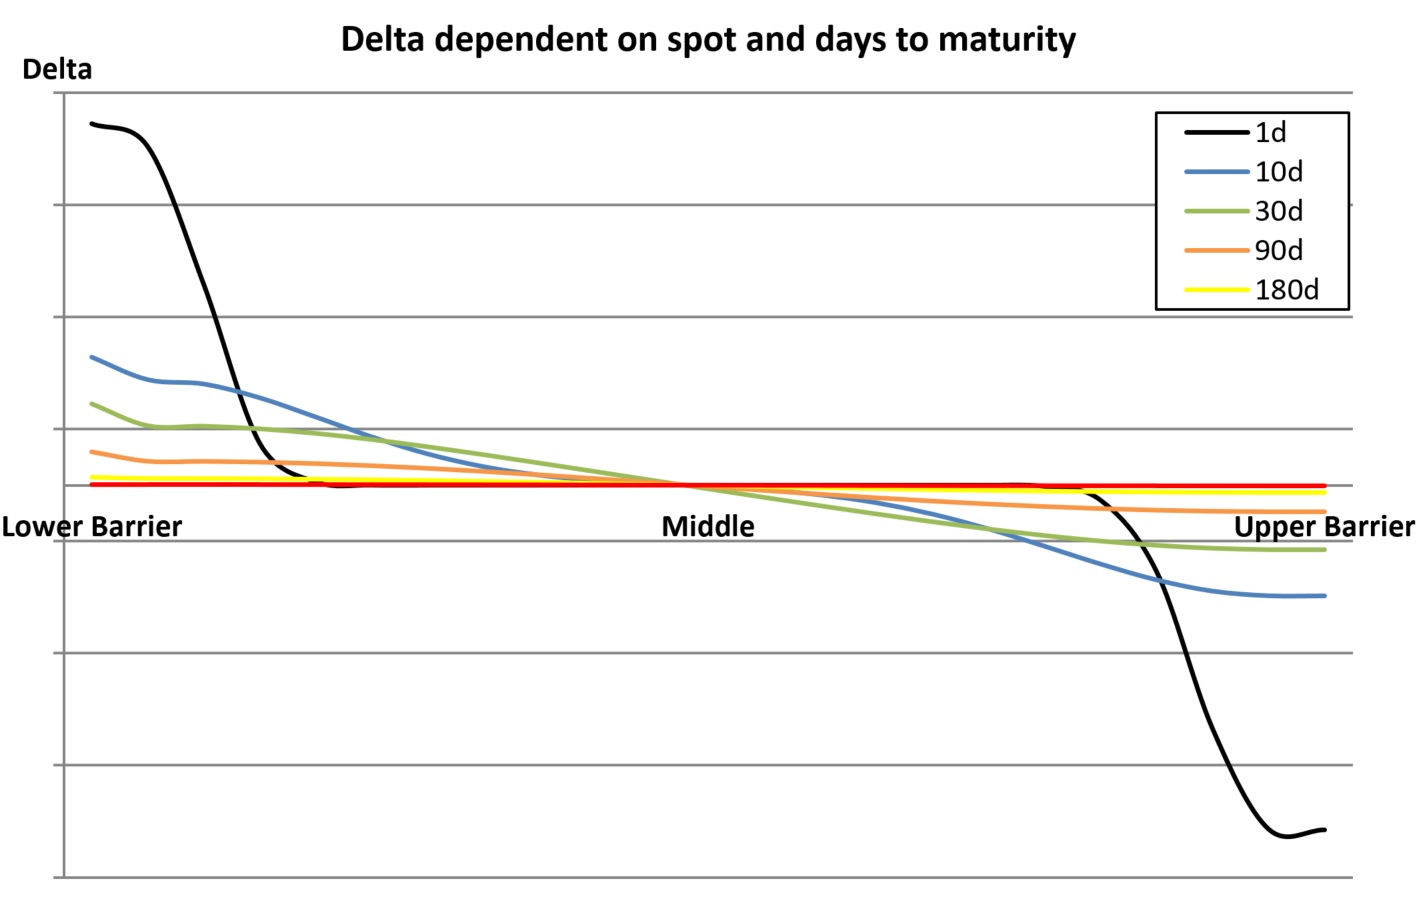 Delta dependent spot days inline warrants